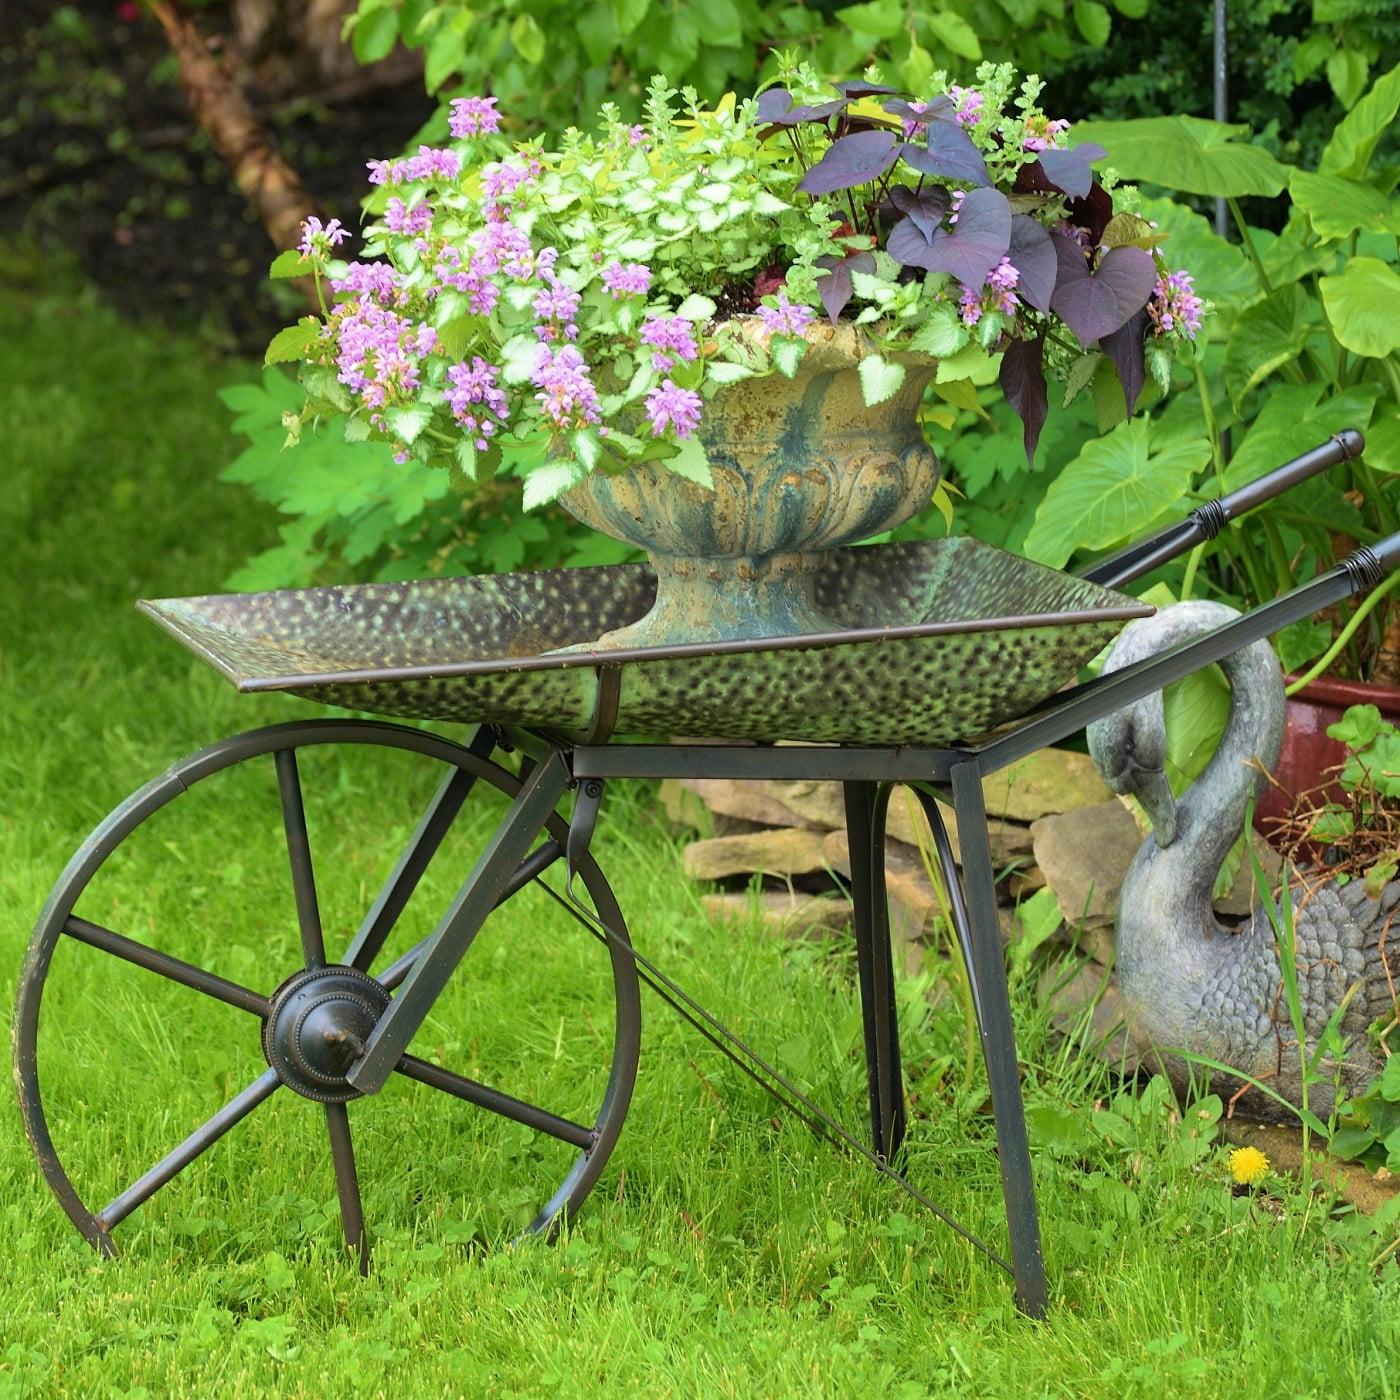 Old Style Galvanized Farmhouse Wheelbarrow with Moving Wheels